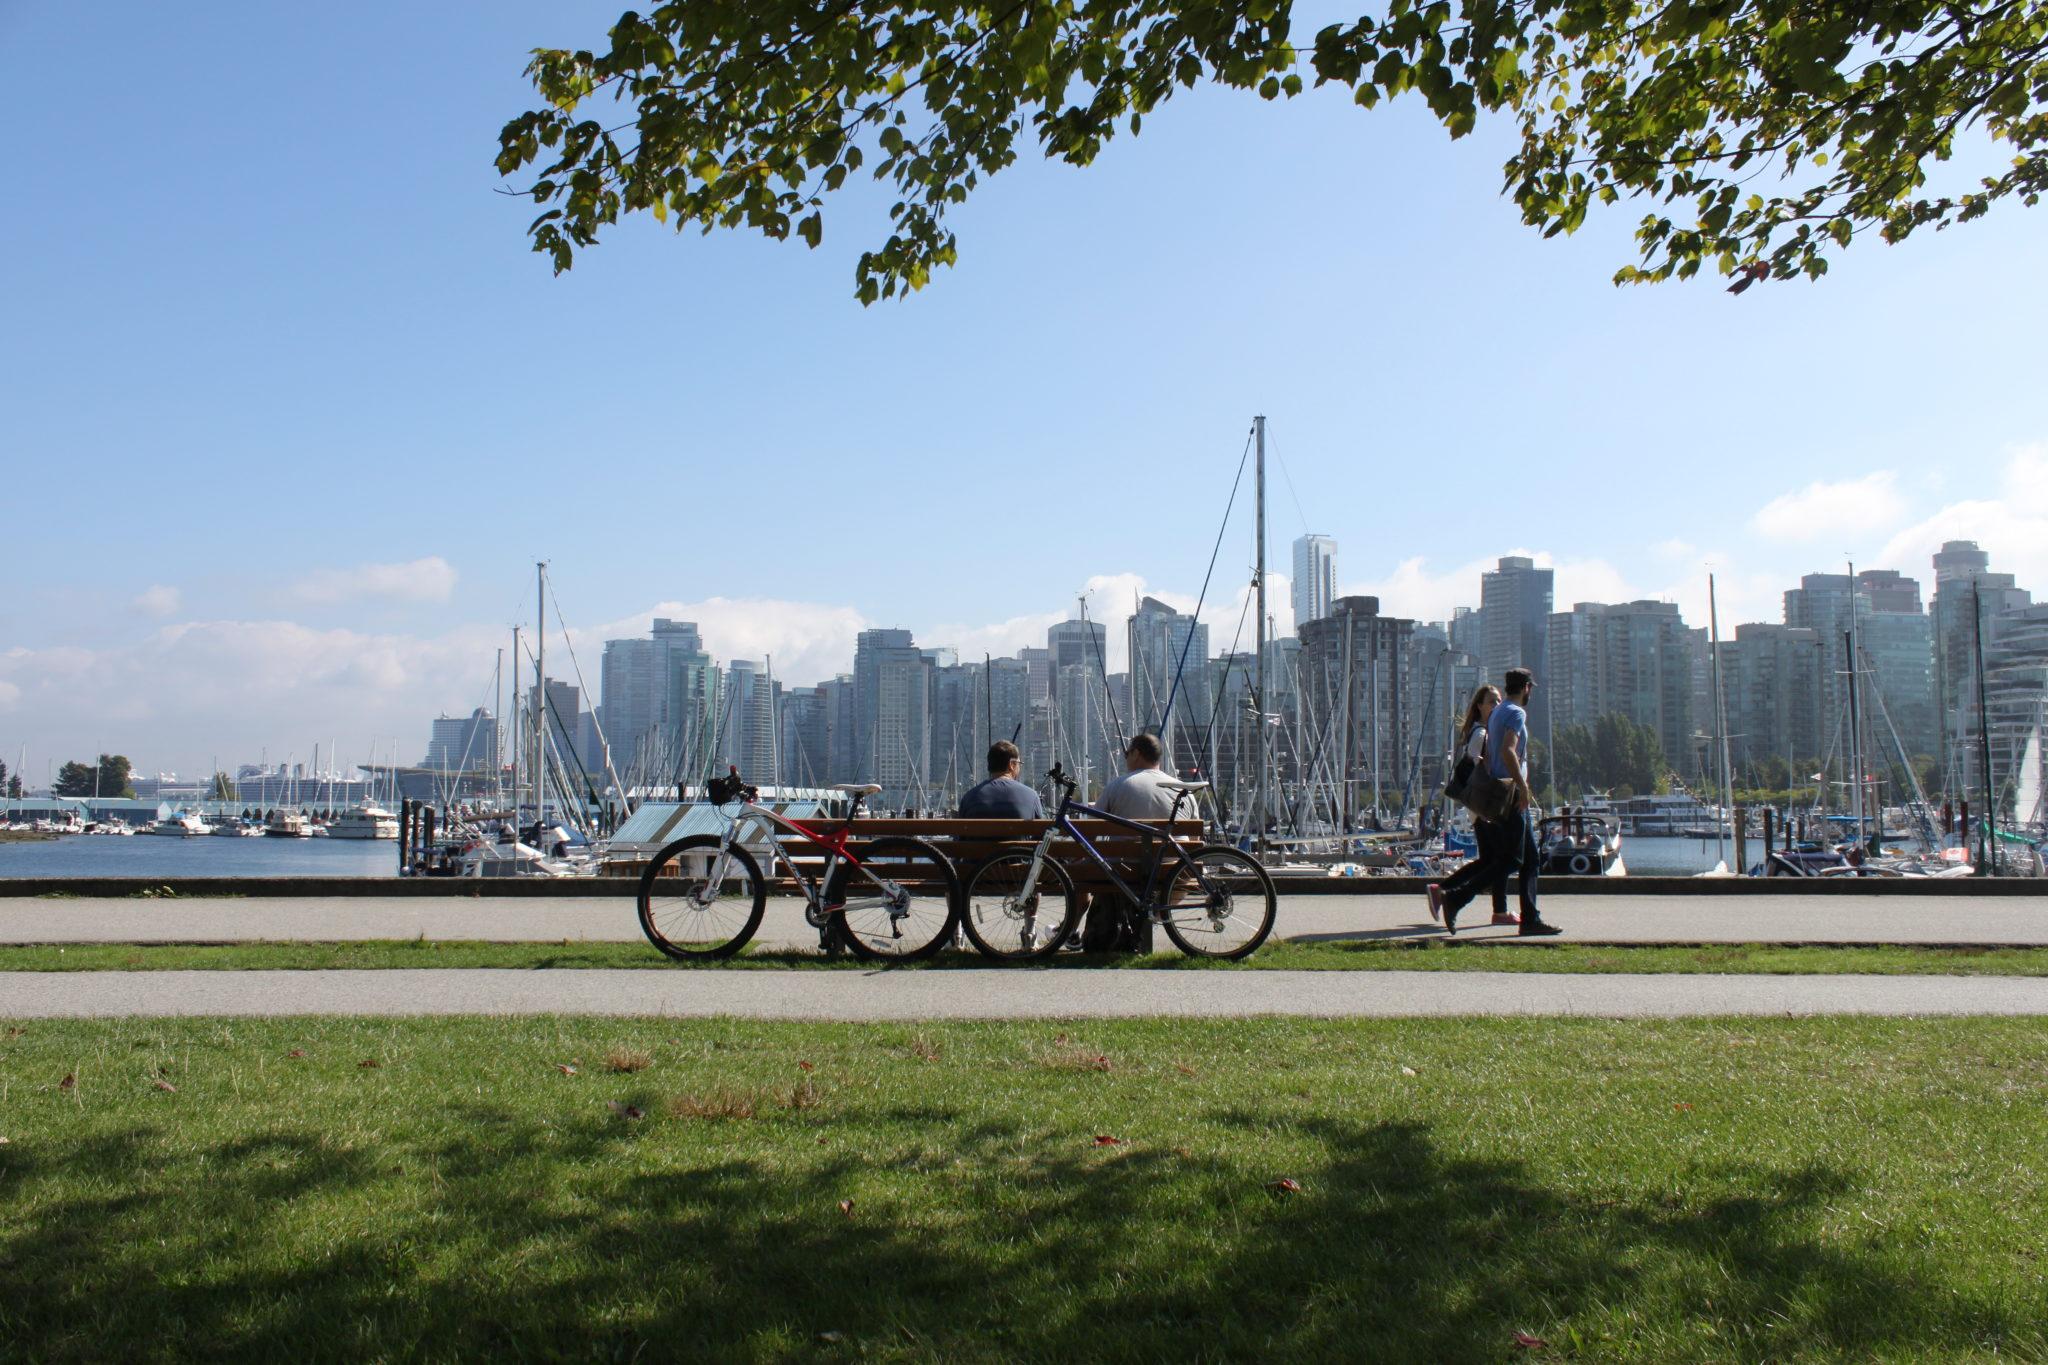 balade-stanley-park-vancouver-canada